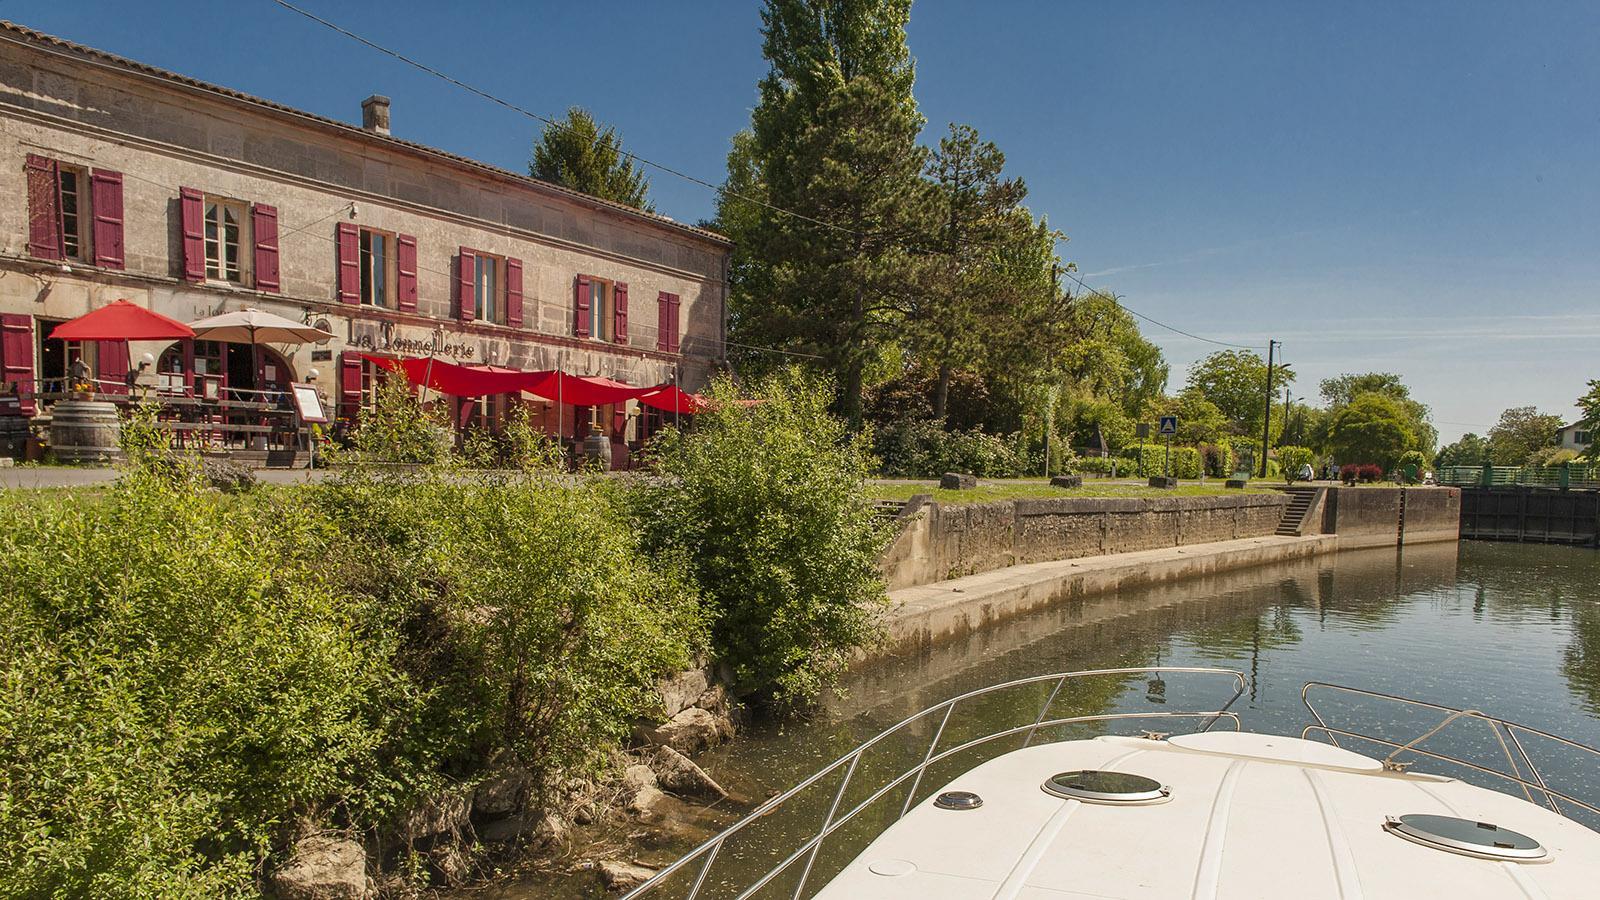 La Tonnellerie von Châteauneuf-sur-Charente liegt direkt am Fluss. Foto: Hilke Maunder